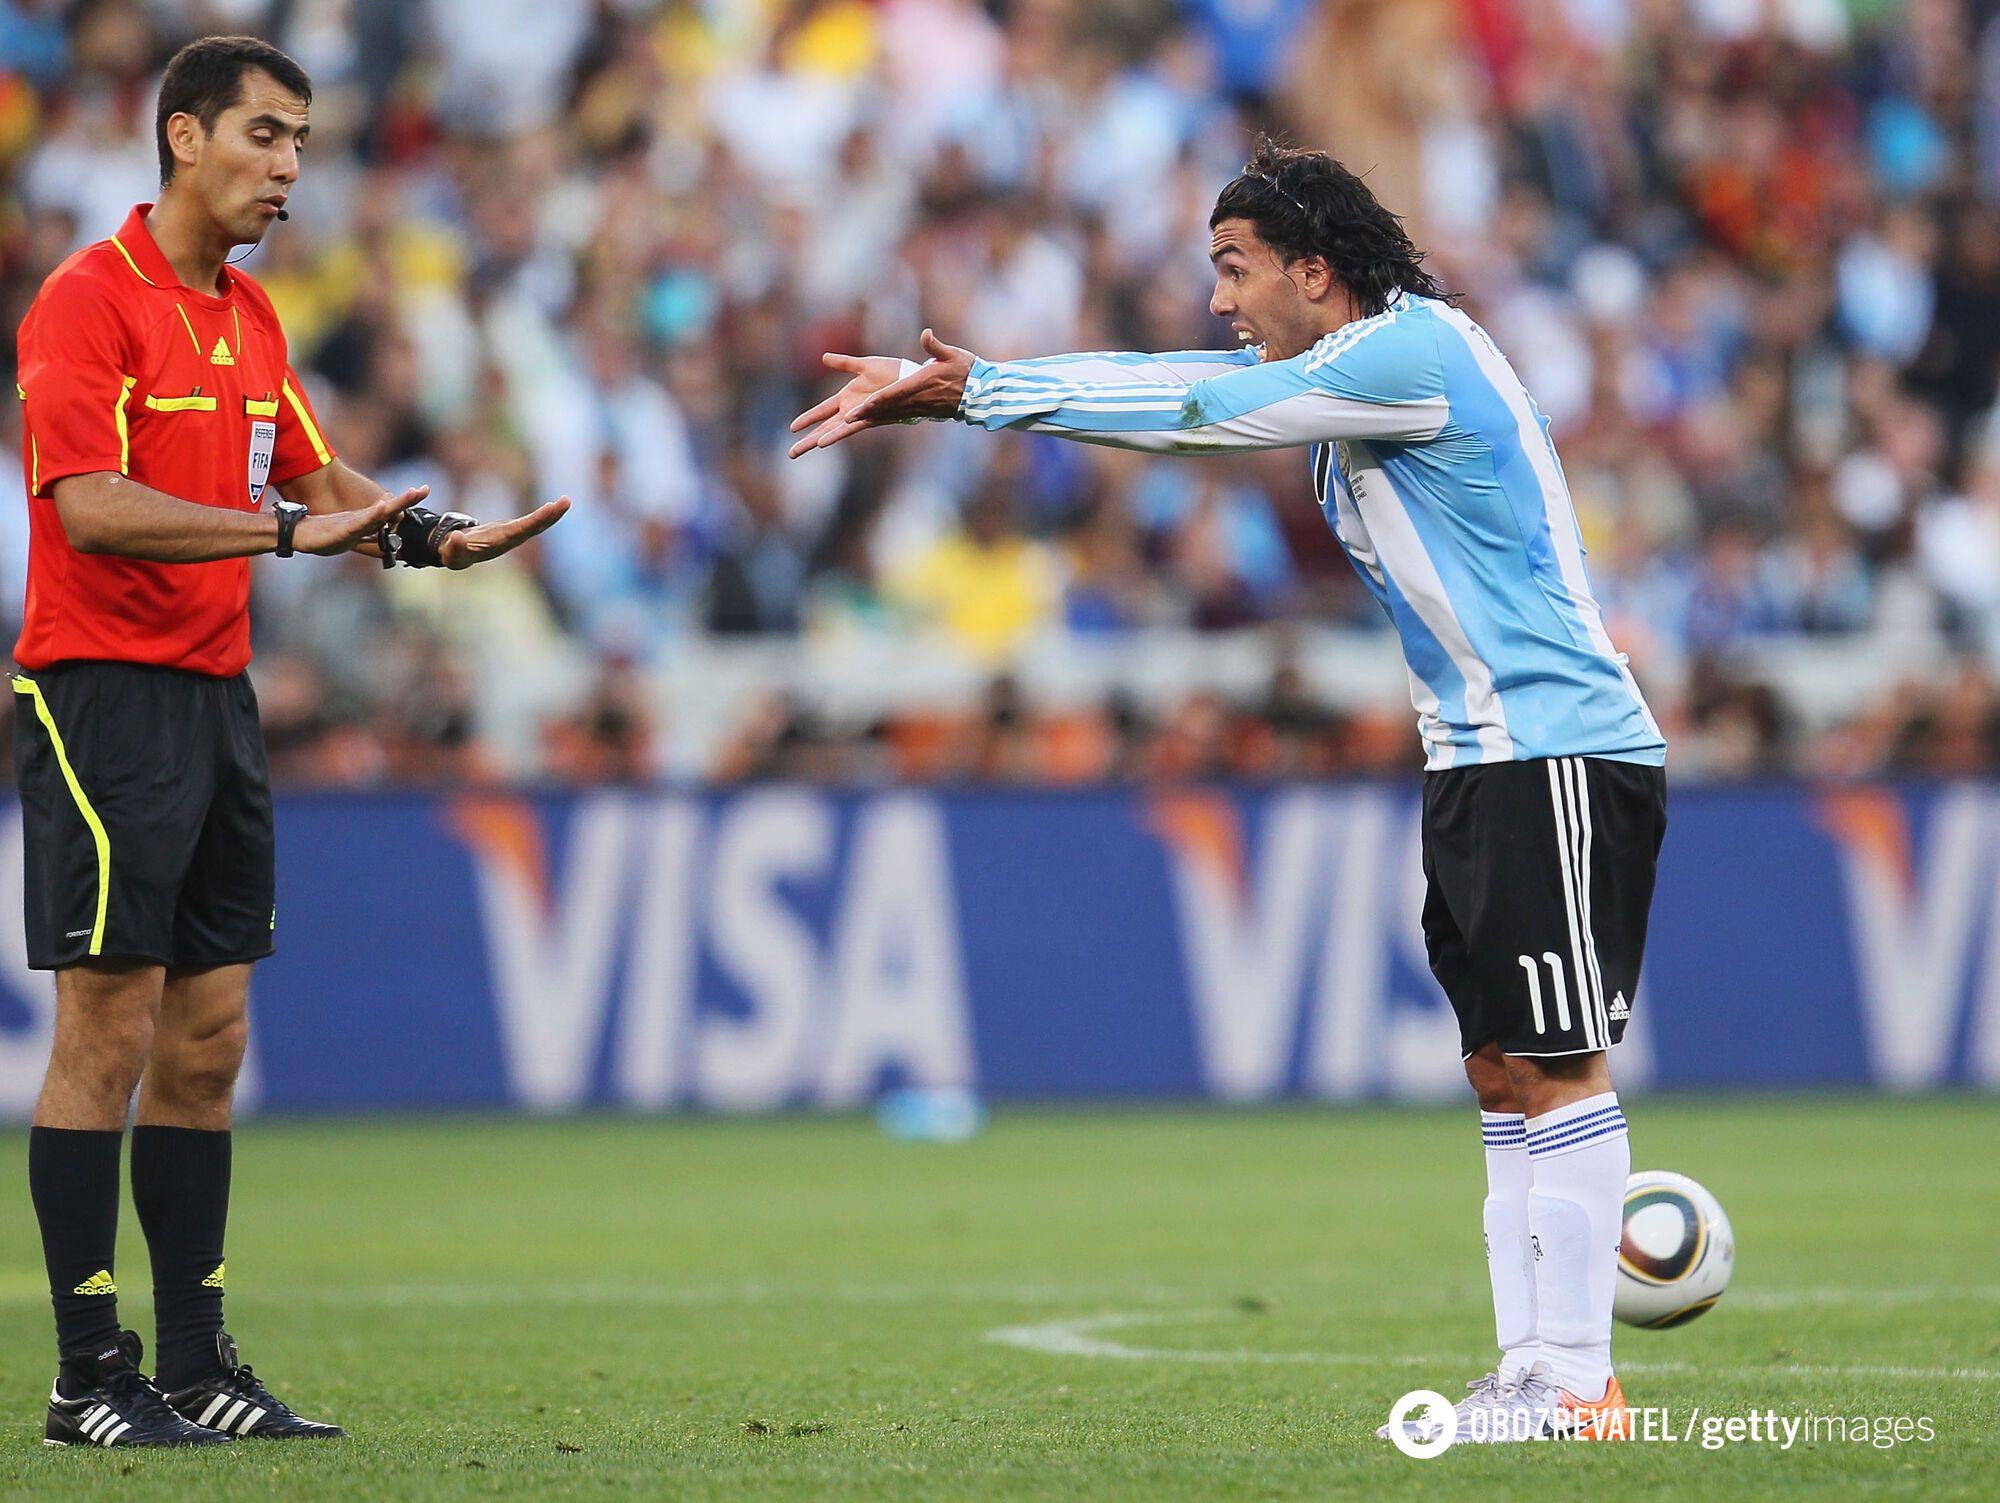 Аргентина – Хорватия – 0-3: онлайн-трансляция матча ЧМ-2018